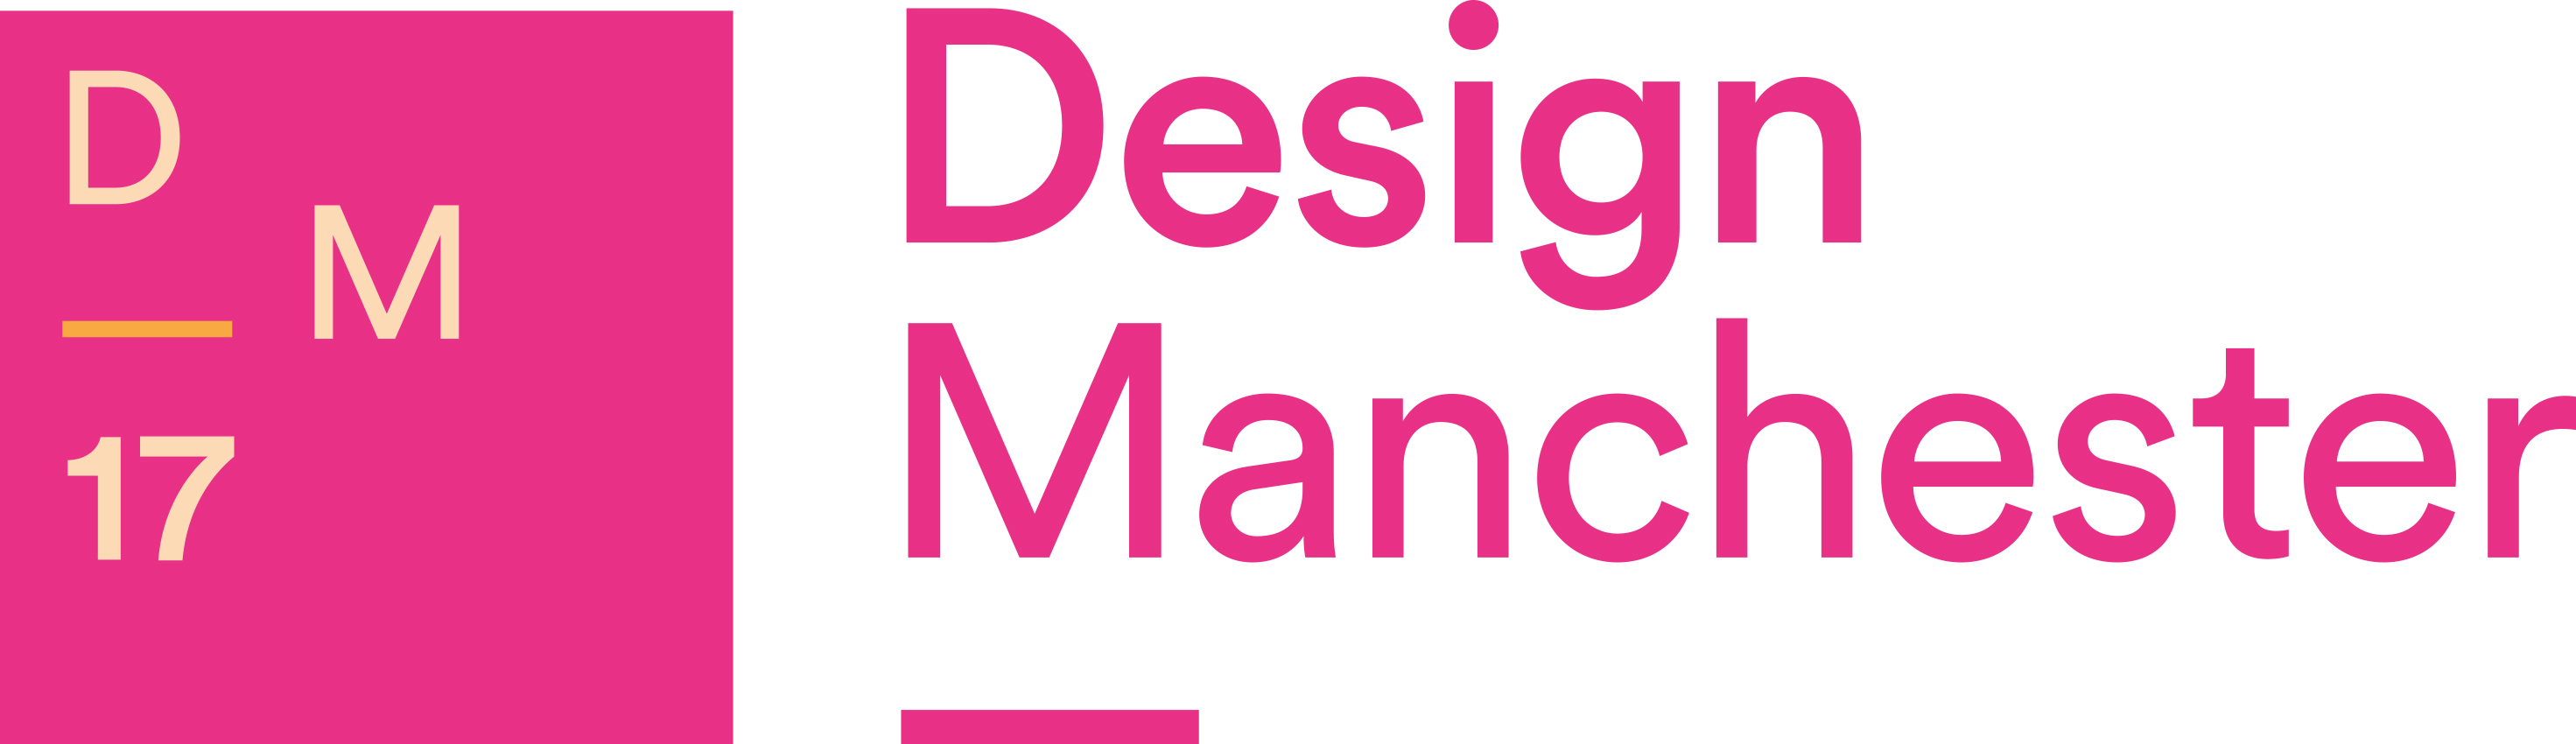 Design Manchester logo